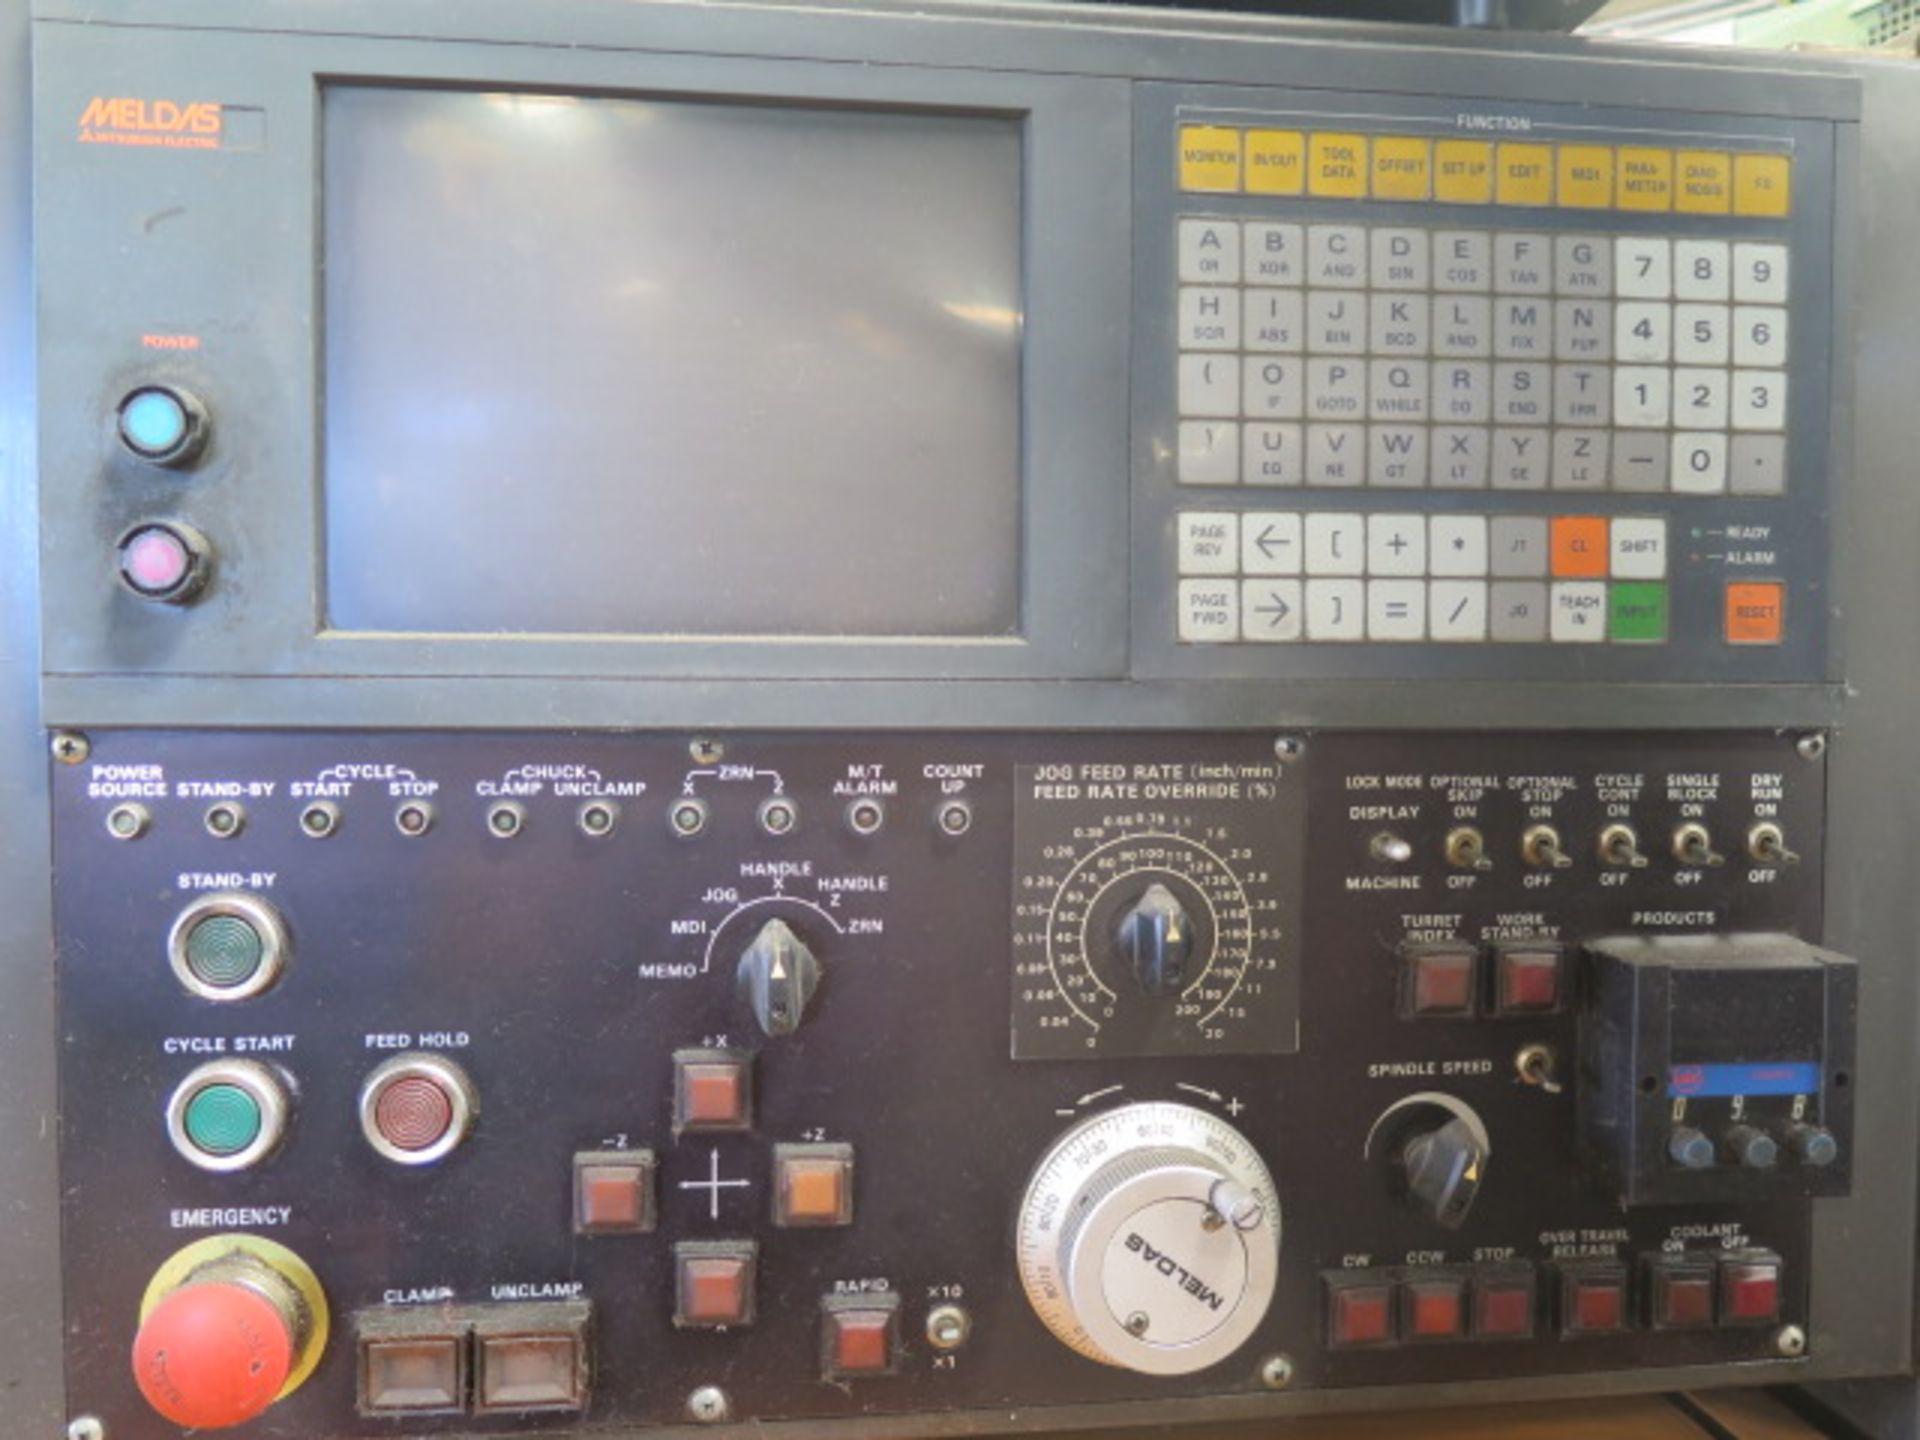 Tsugami NM3 CNC Turning Center s/n 6029 w/ Mitsubishi Meldas Controls, 8-Station Turret, SOLD AS IS - Image 6 of 16